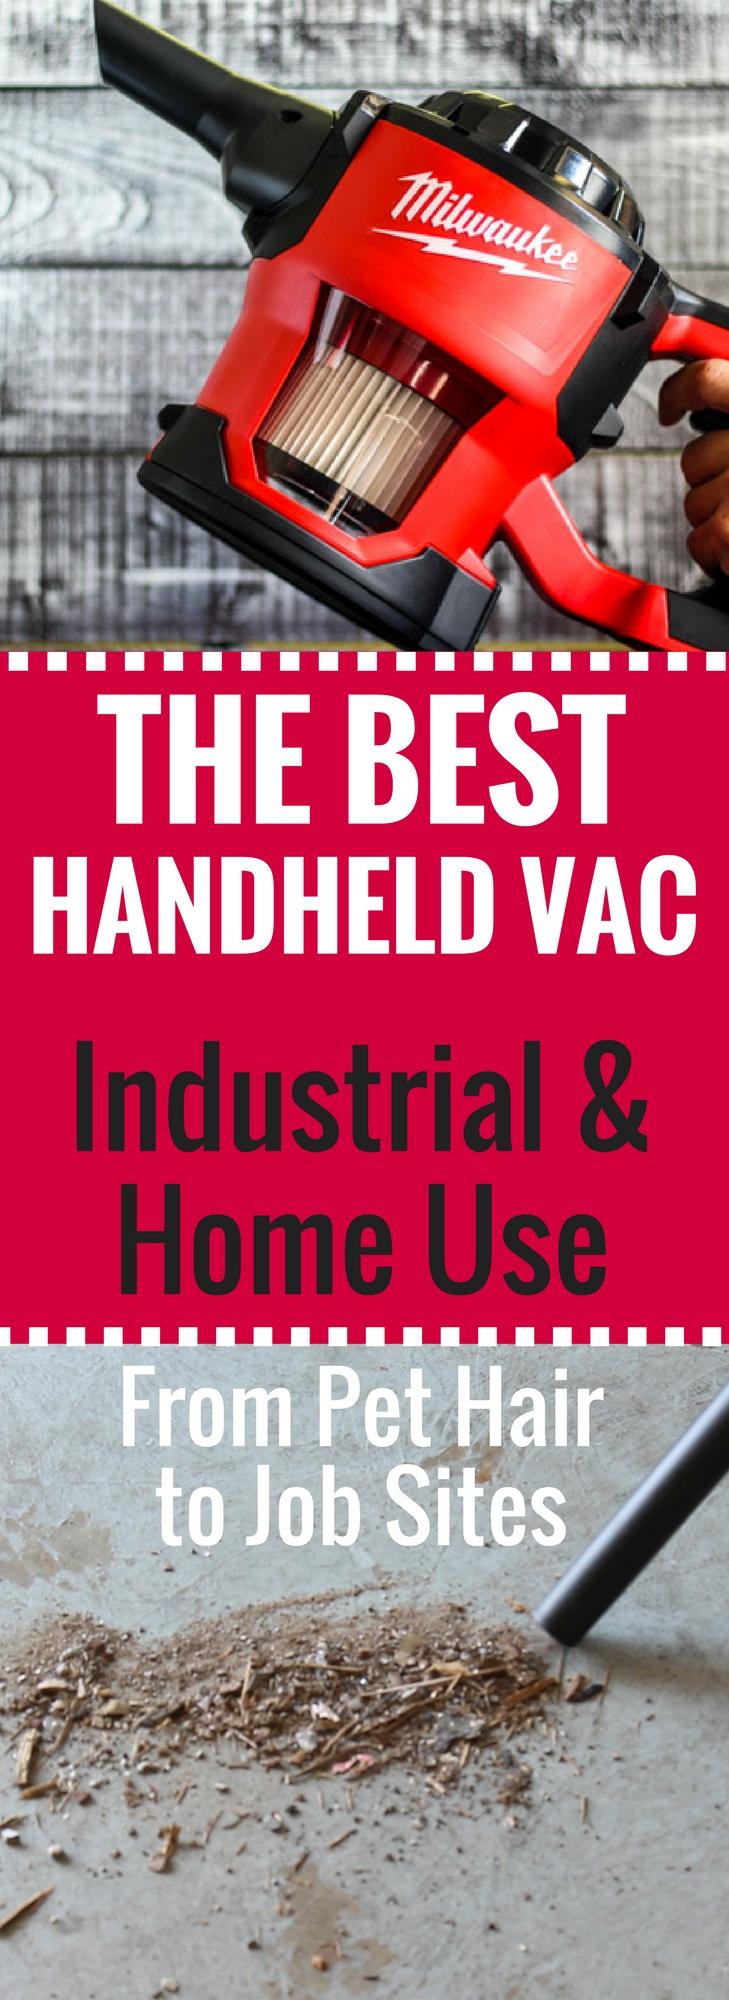 The Milwaukee Handheld Vacuum is the BEST cordless vacuum on the market!